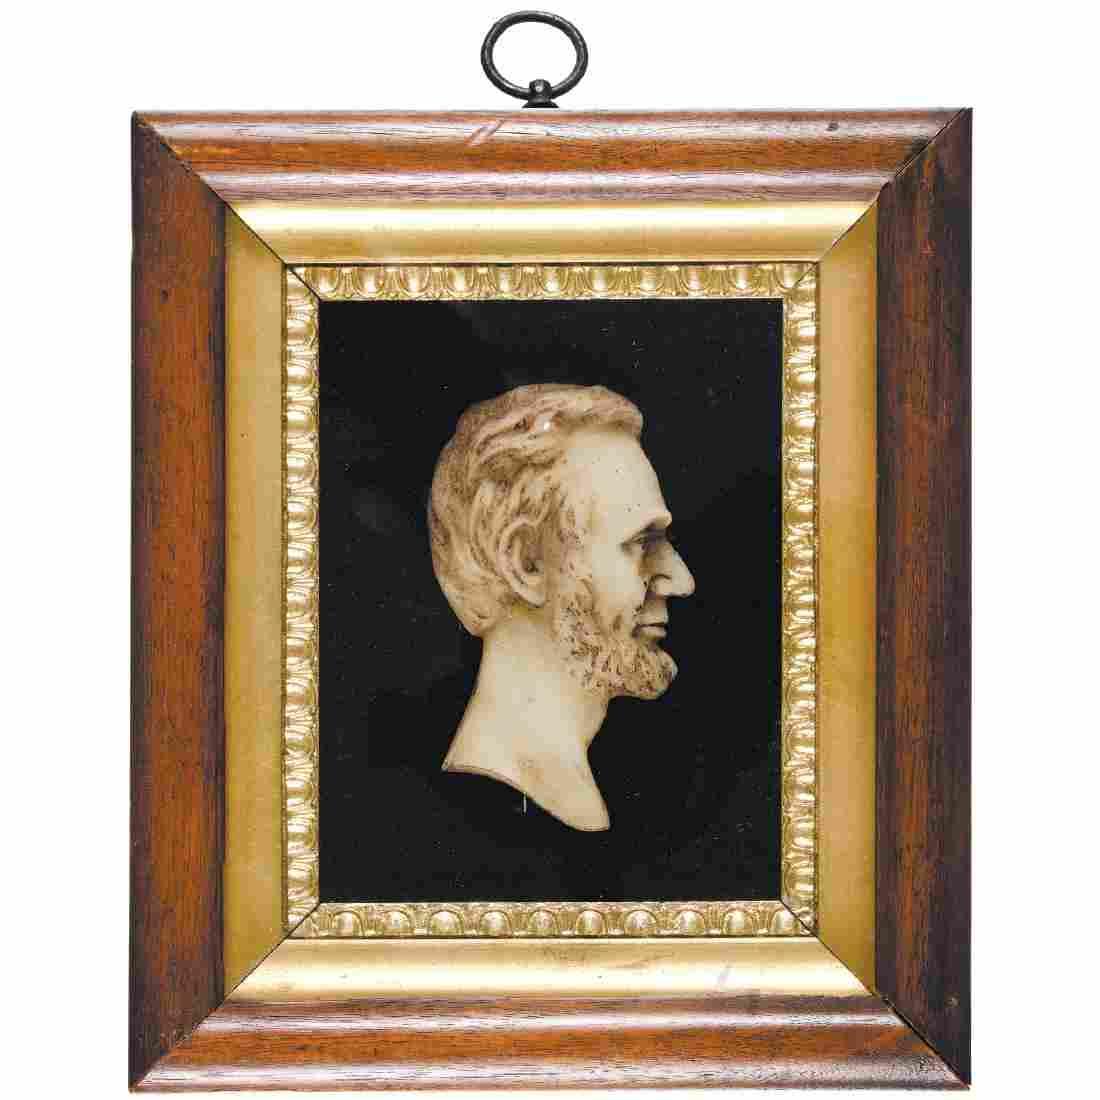 1860s Civil War Era Abraham Lincoln Wax Profile